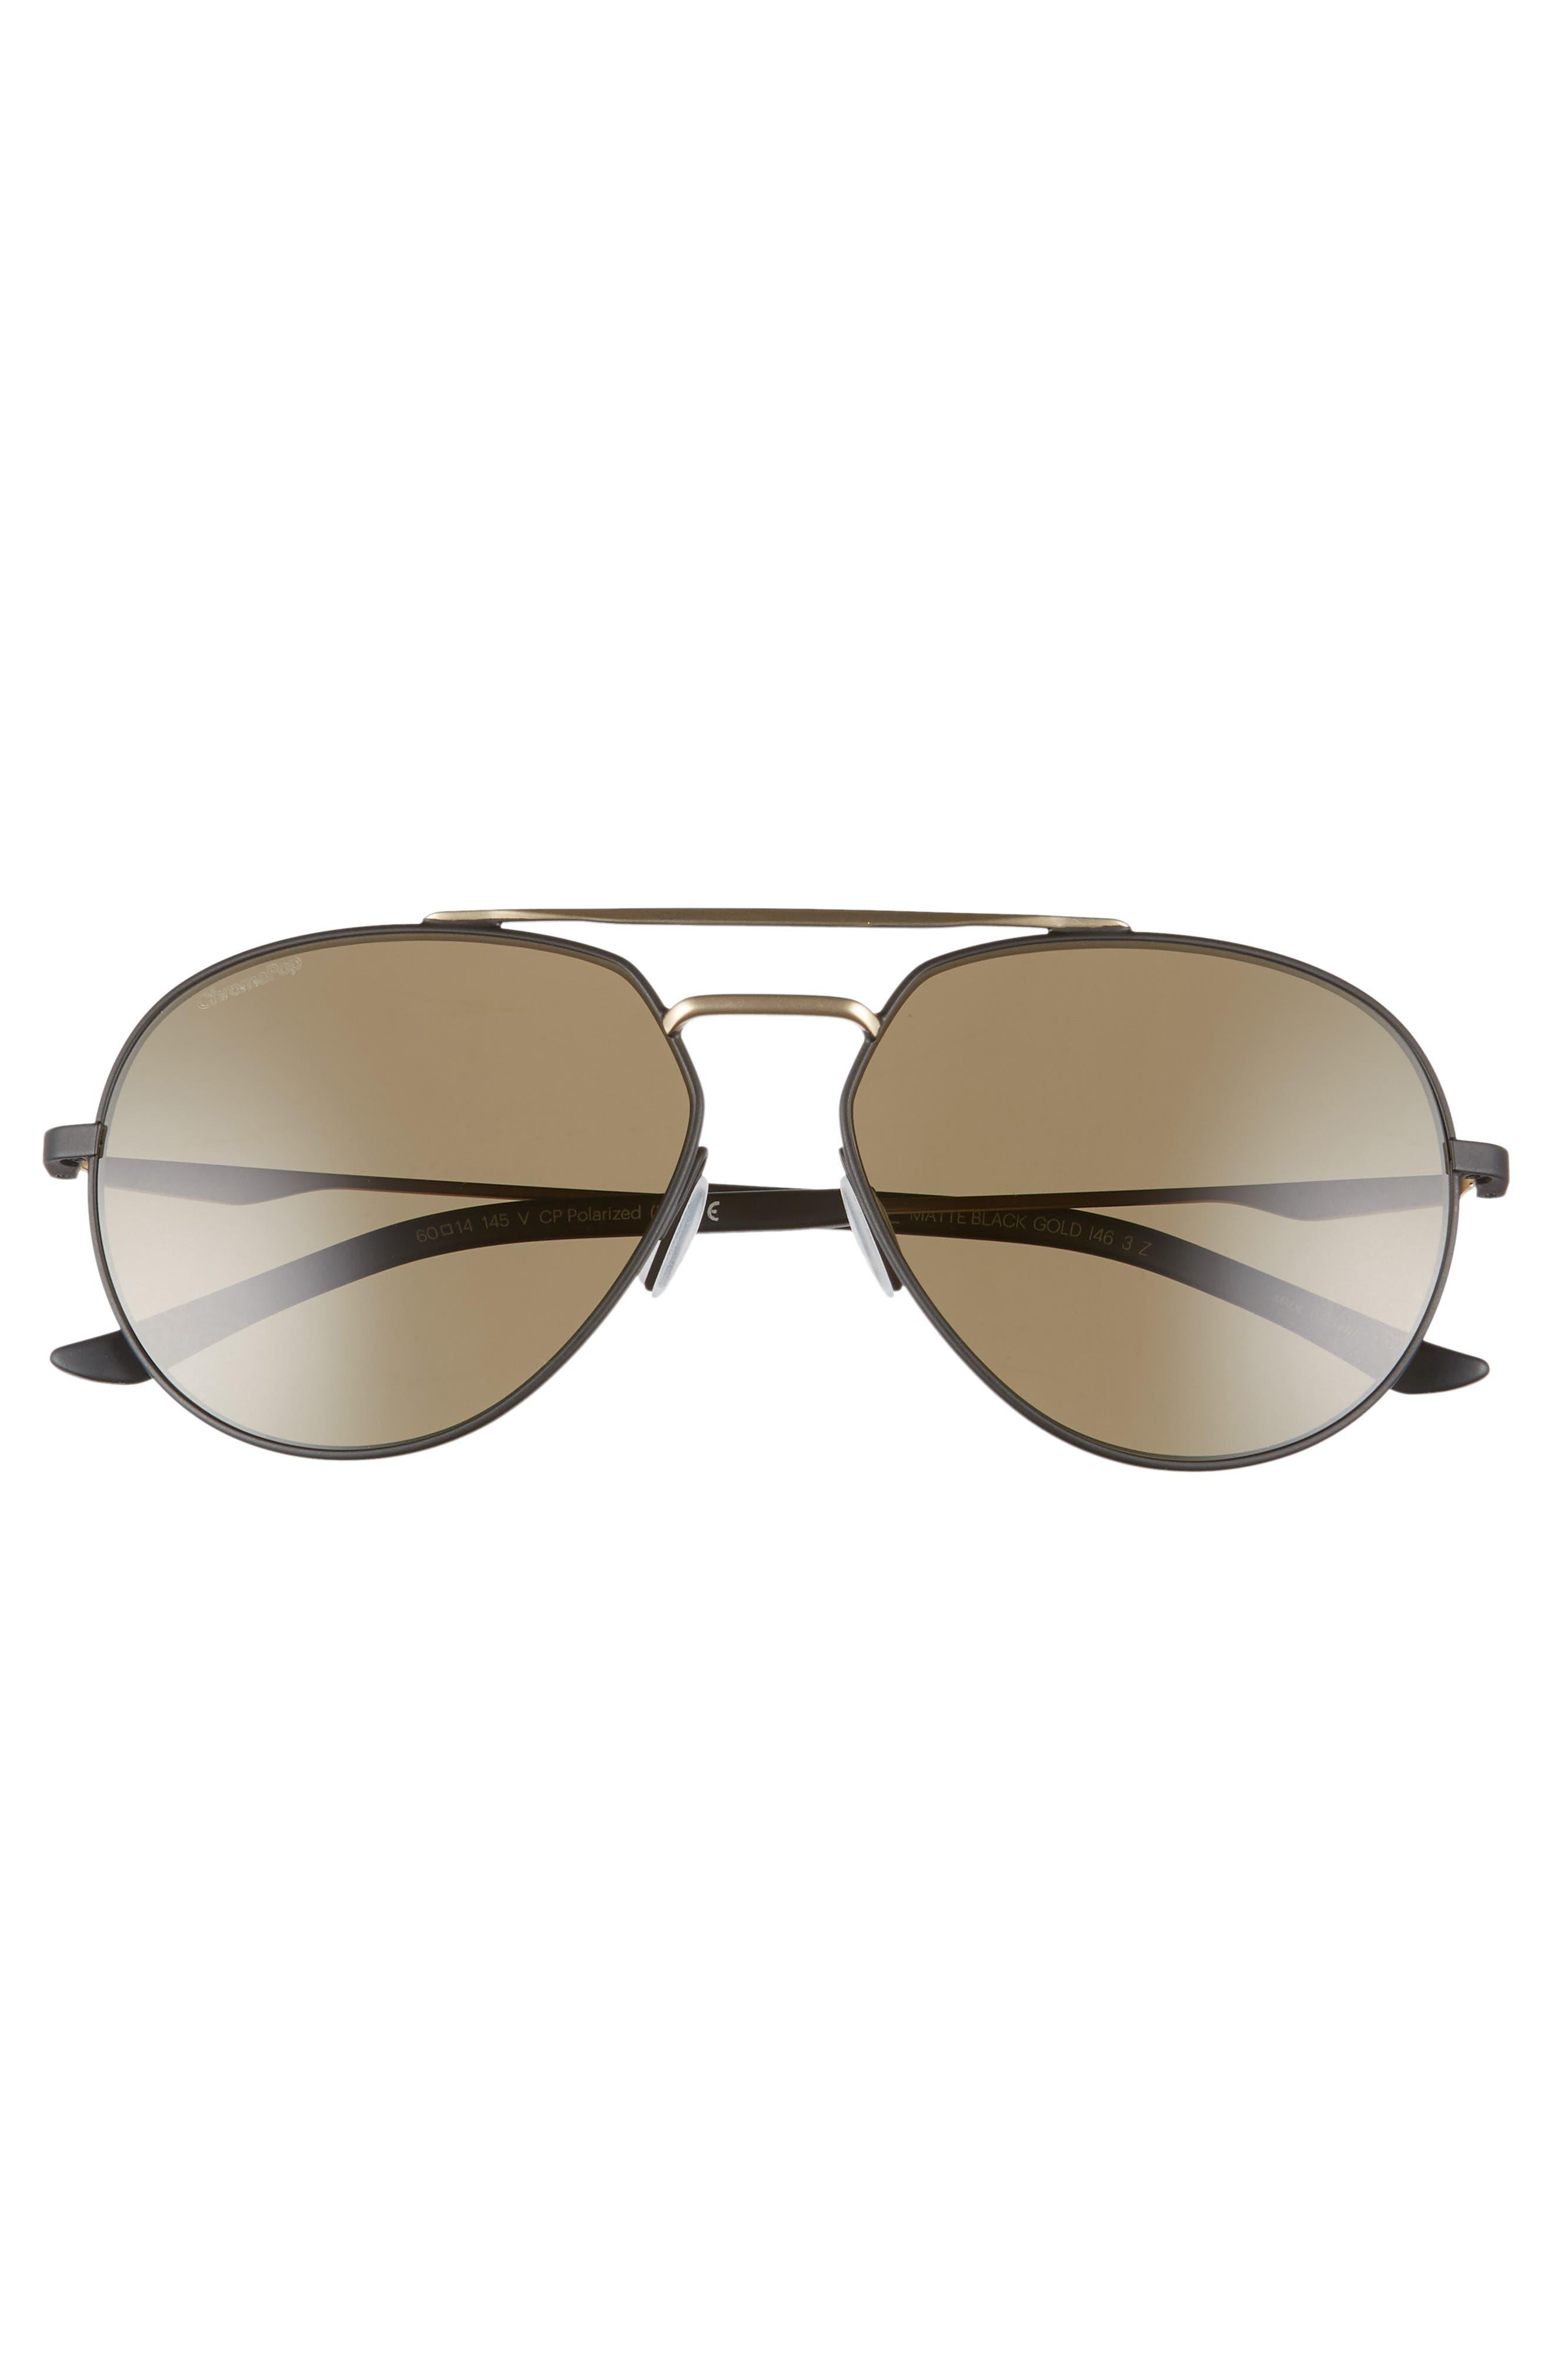 SMITH,                             Westgate 60mm ChromaPop<sup>™</sup> Polarized Aviator Sunglasses,                             Alternate thumbnail 3, color,                             MATTE BLACK/ GOLD